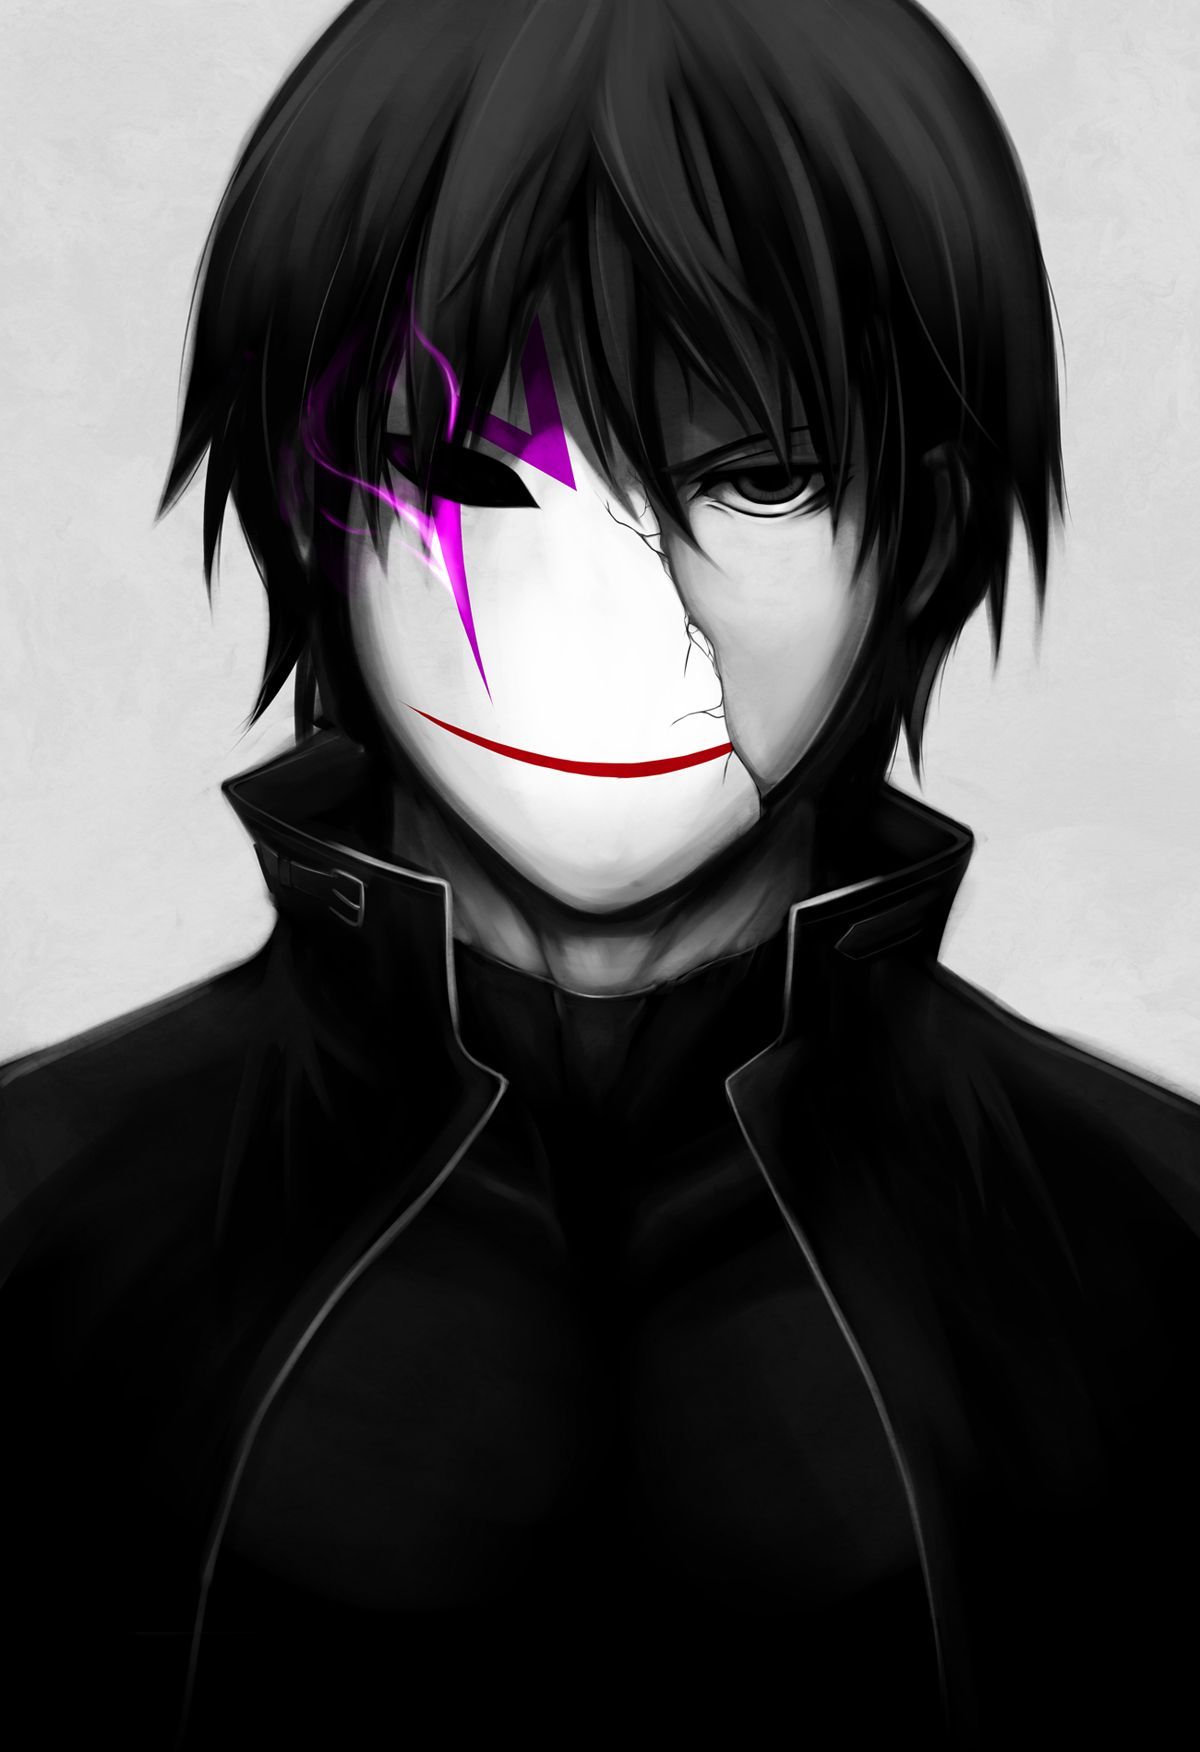 Happy Hei Day Dark Anime Anime Shows Awesome Anime